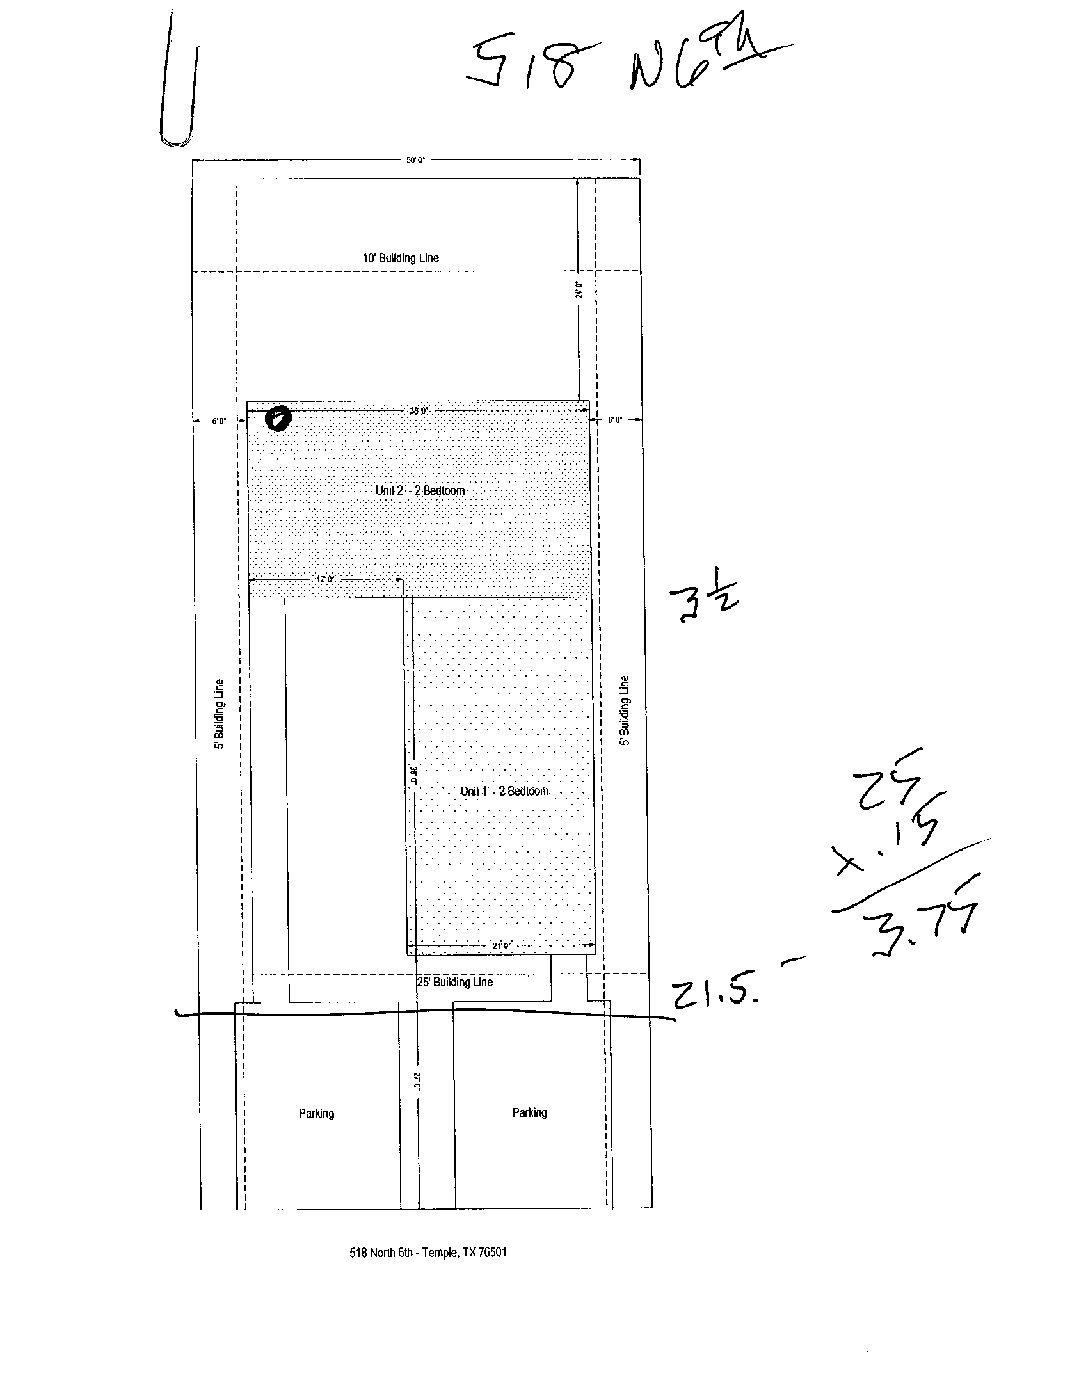 517 (A) N. 6th Temple, Tx 76501 • LVR Management